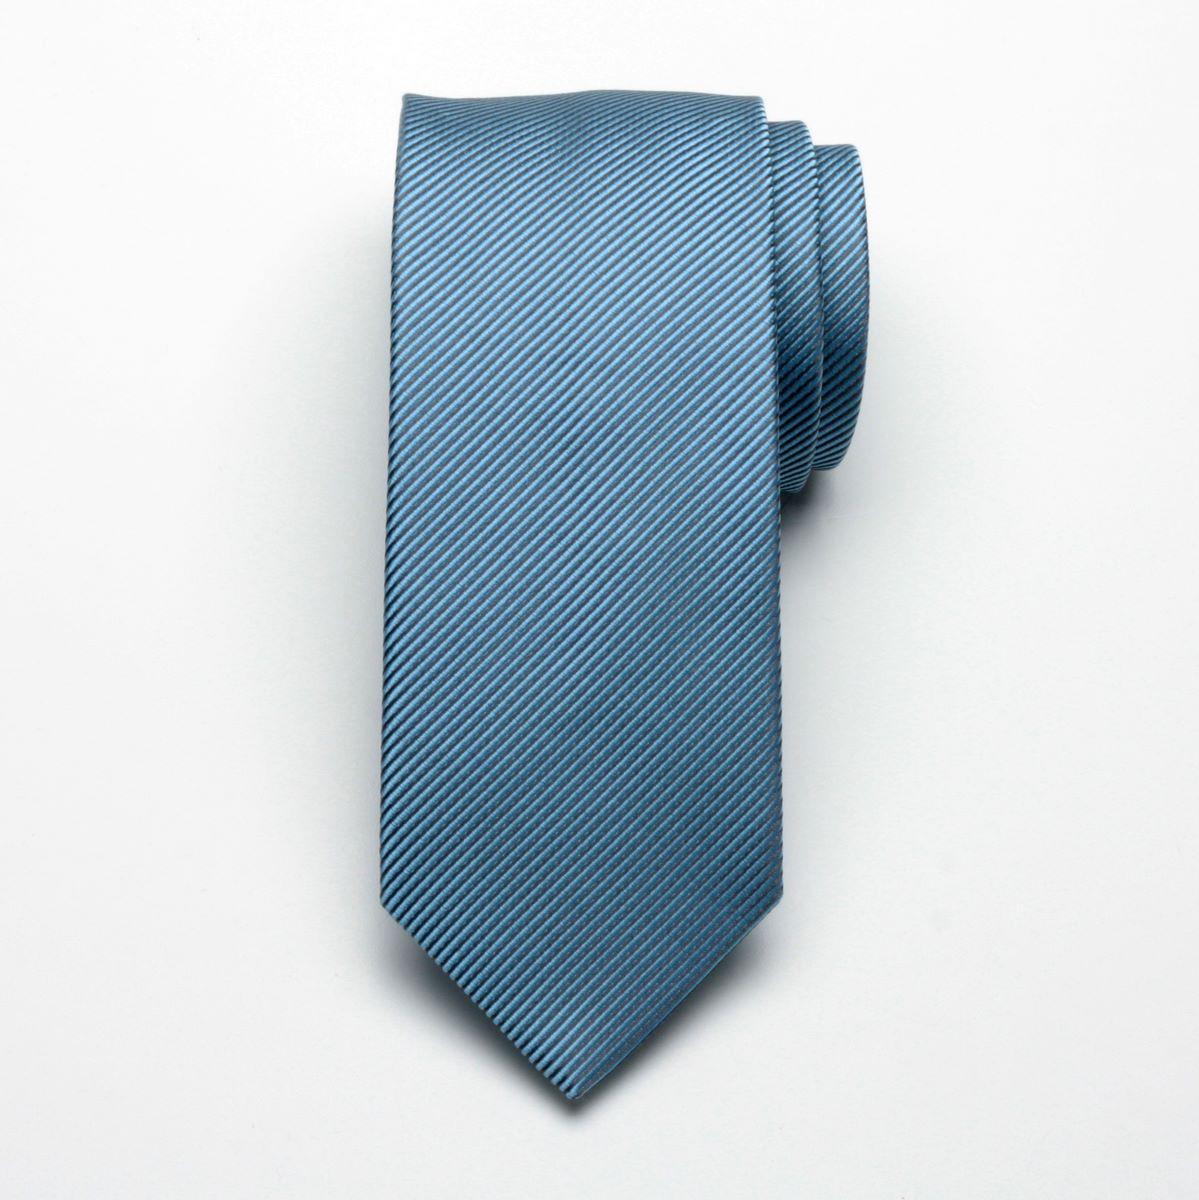 Krawat jedwabny Fine Selection (wzór 65)